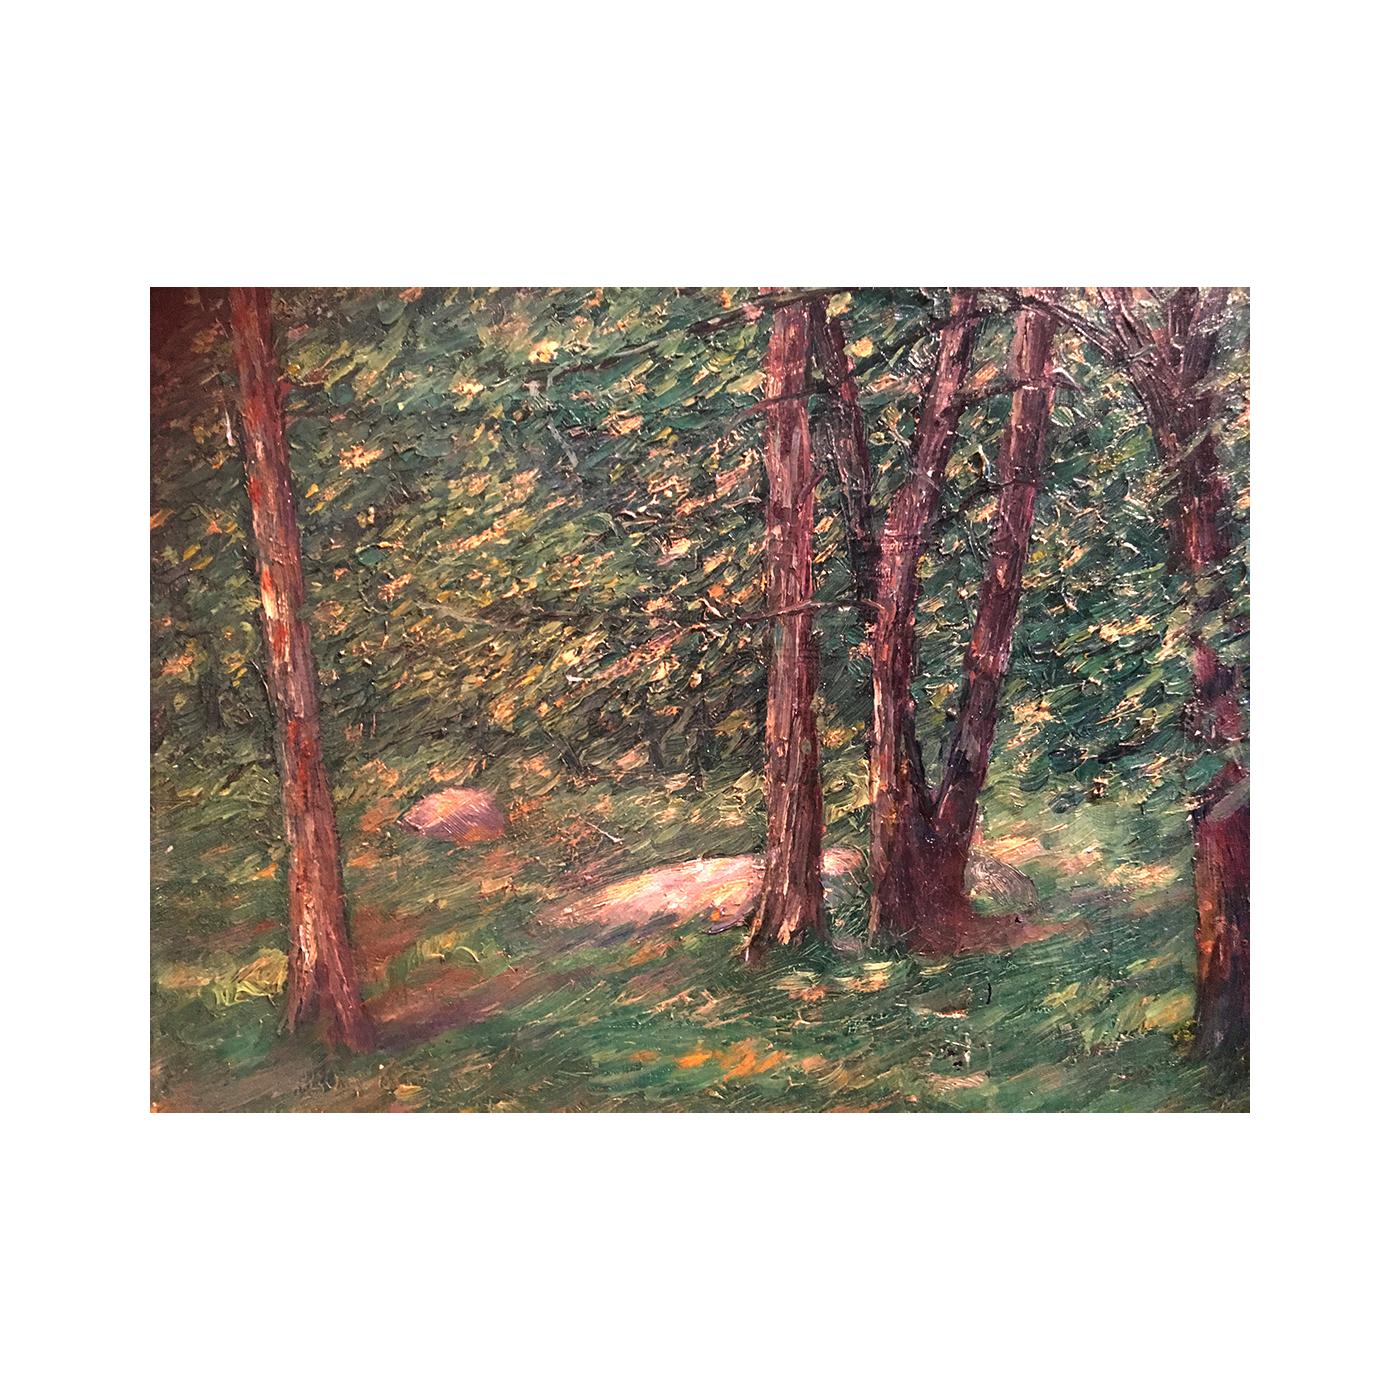 "Frank Fogarty [1887-] New York illustrator impressionist painting""Forest Light"" 1920"